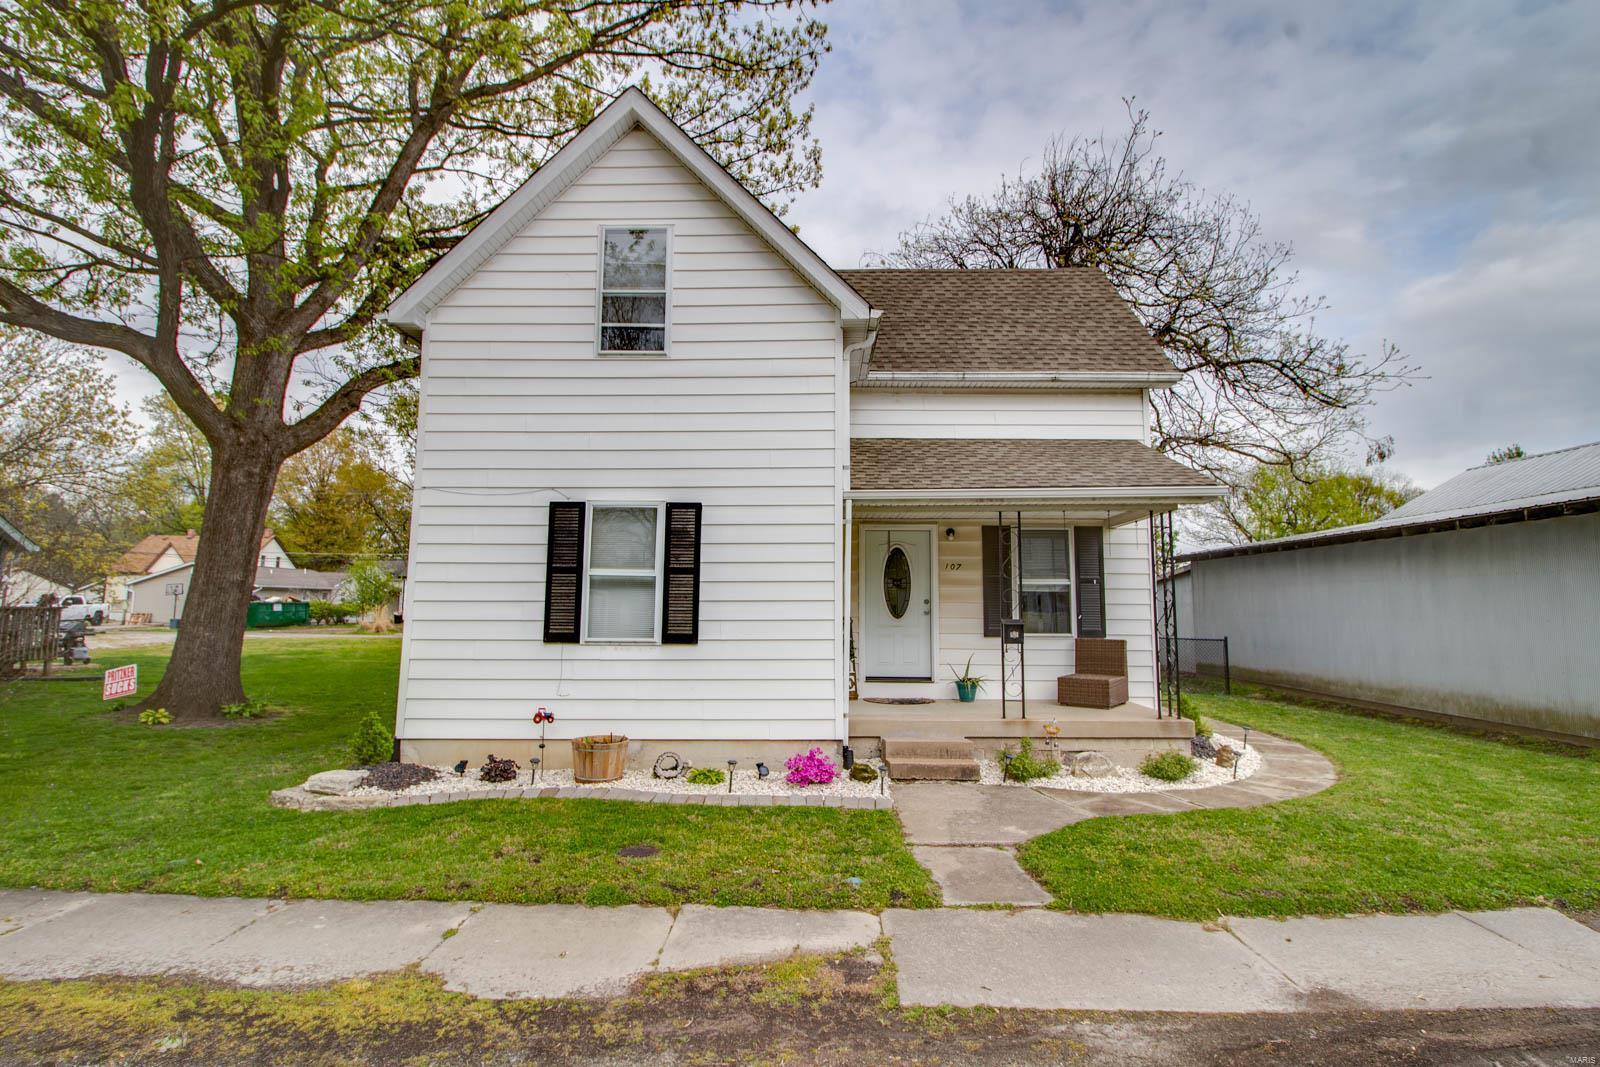 107 S Cherry Street Property Photo - Freeburg, IL real estate listing